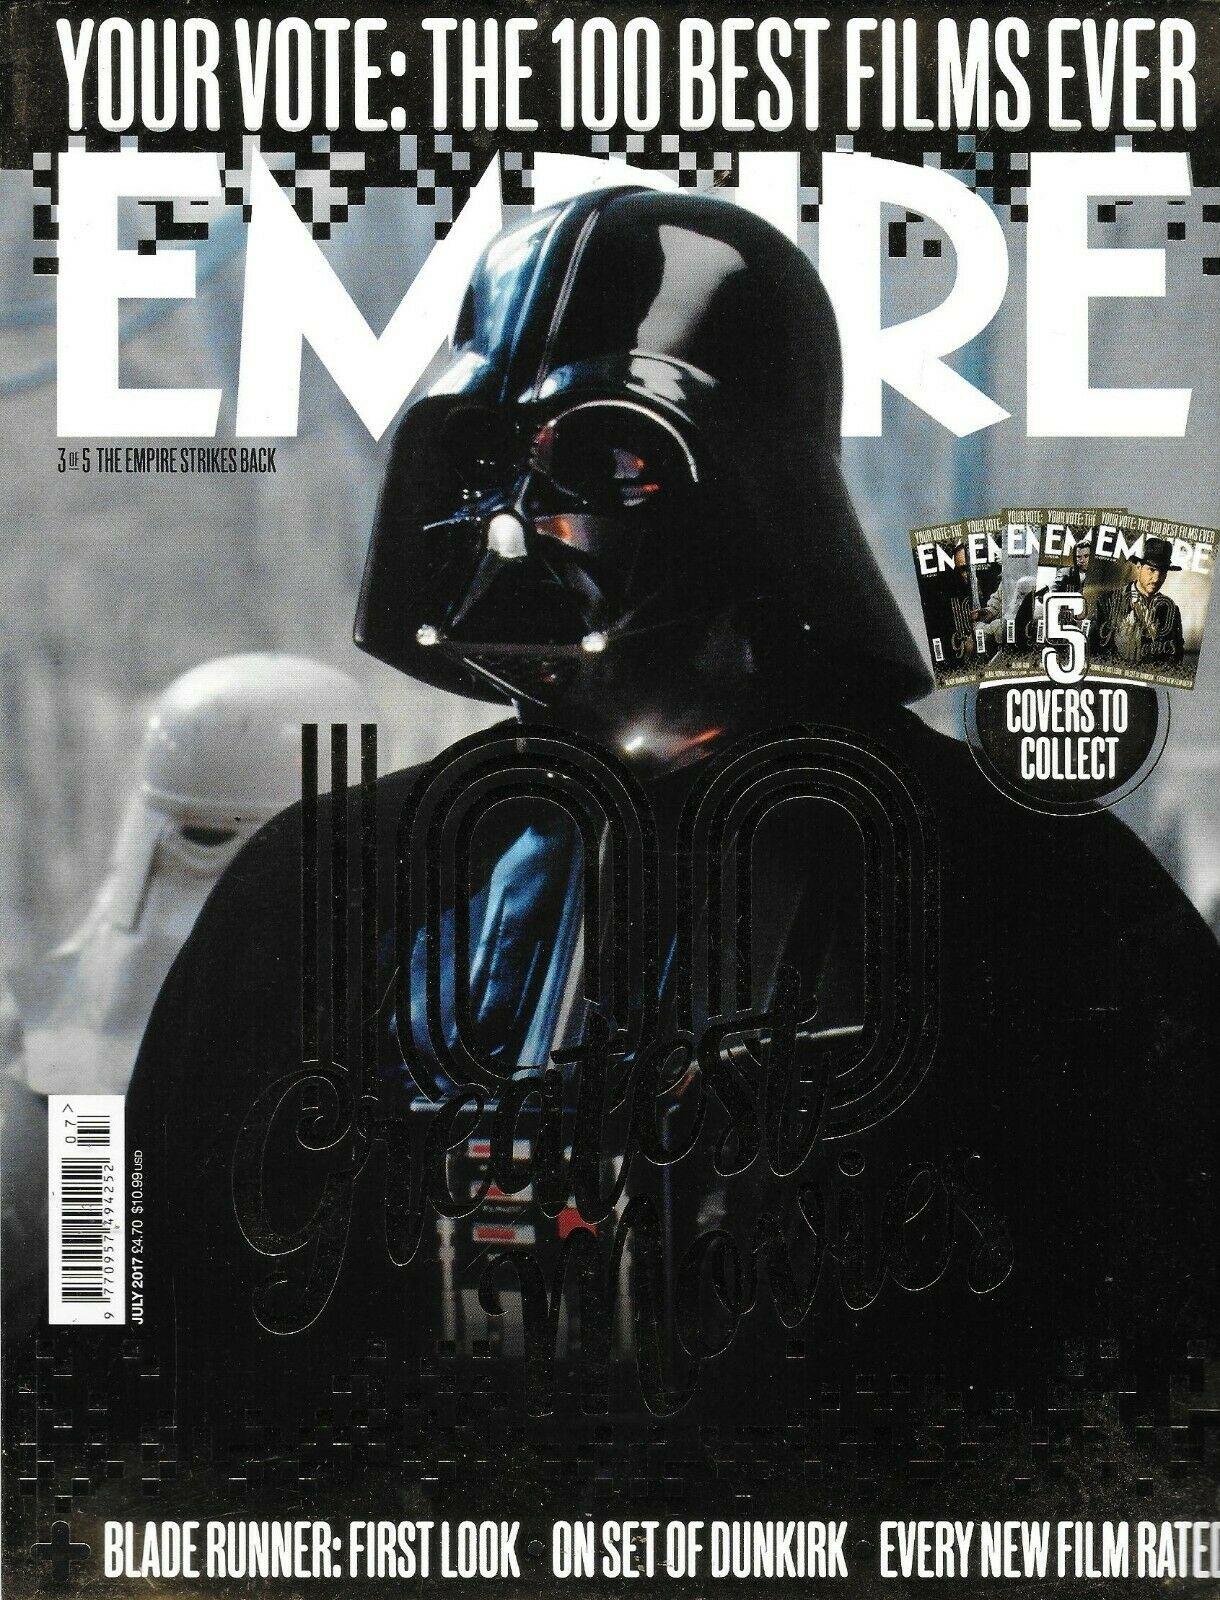 Empire Magazine 338